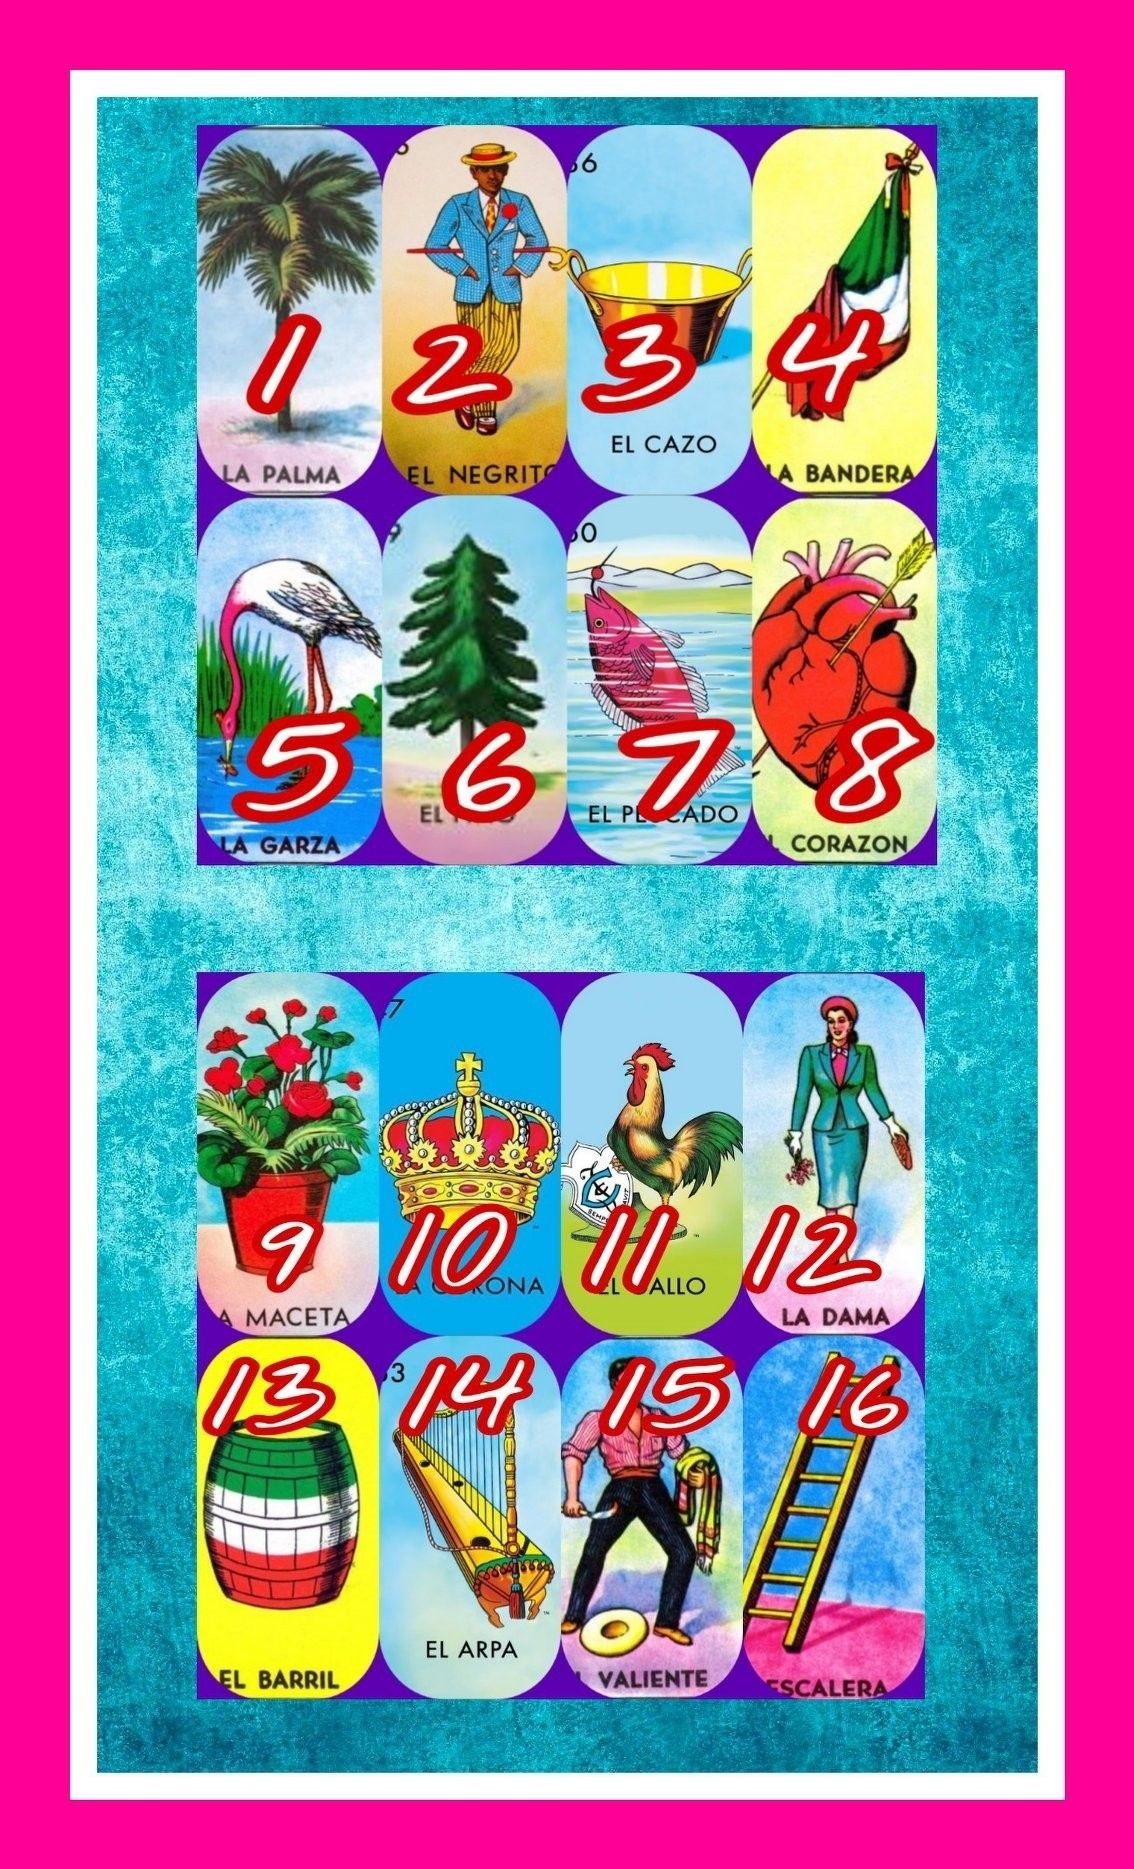 Pin by Clarissa Vasquez on LoteriaMissvaleriedee in 2020